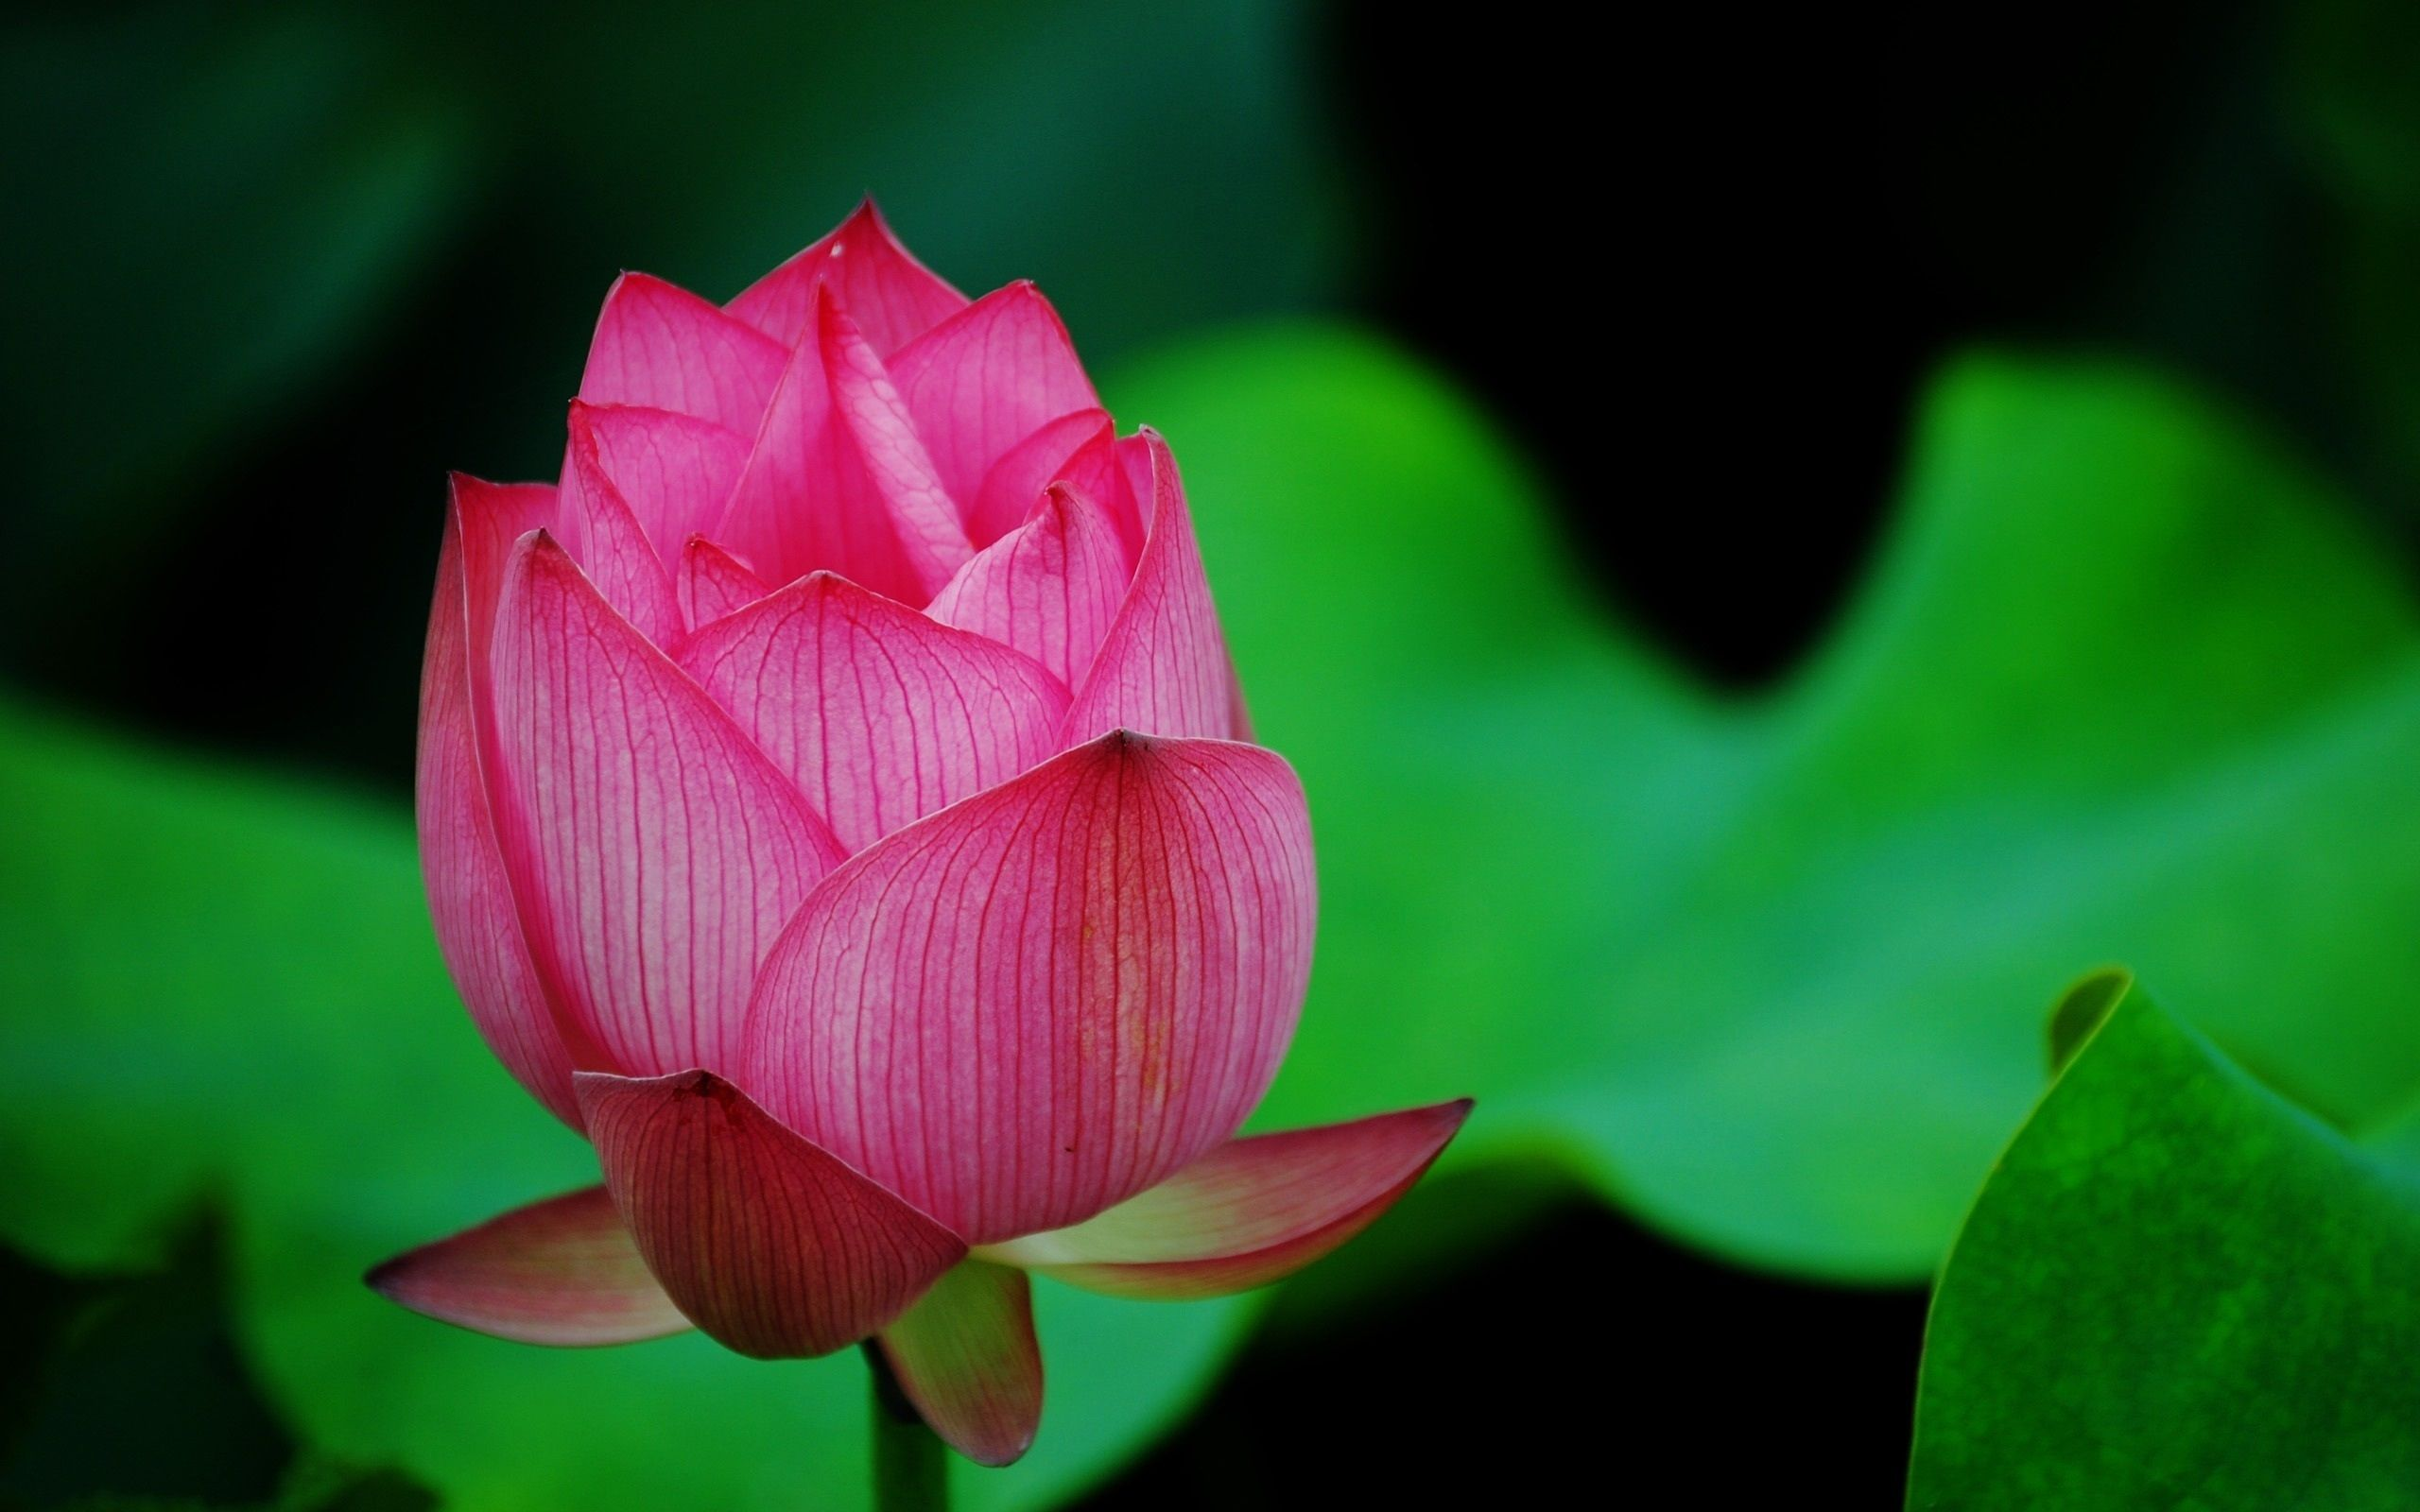 blooming lotus flower hd wallpaper louts flower